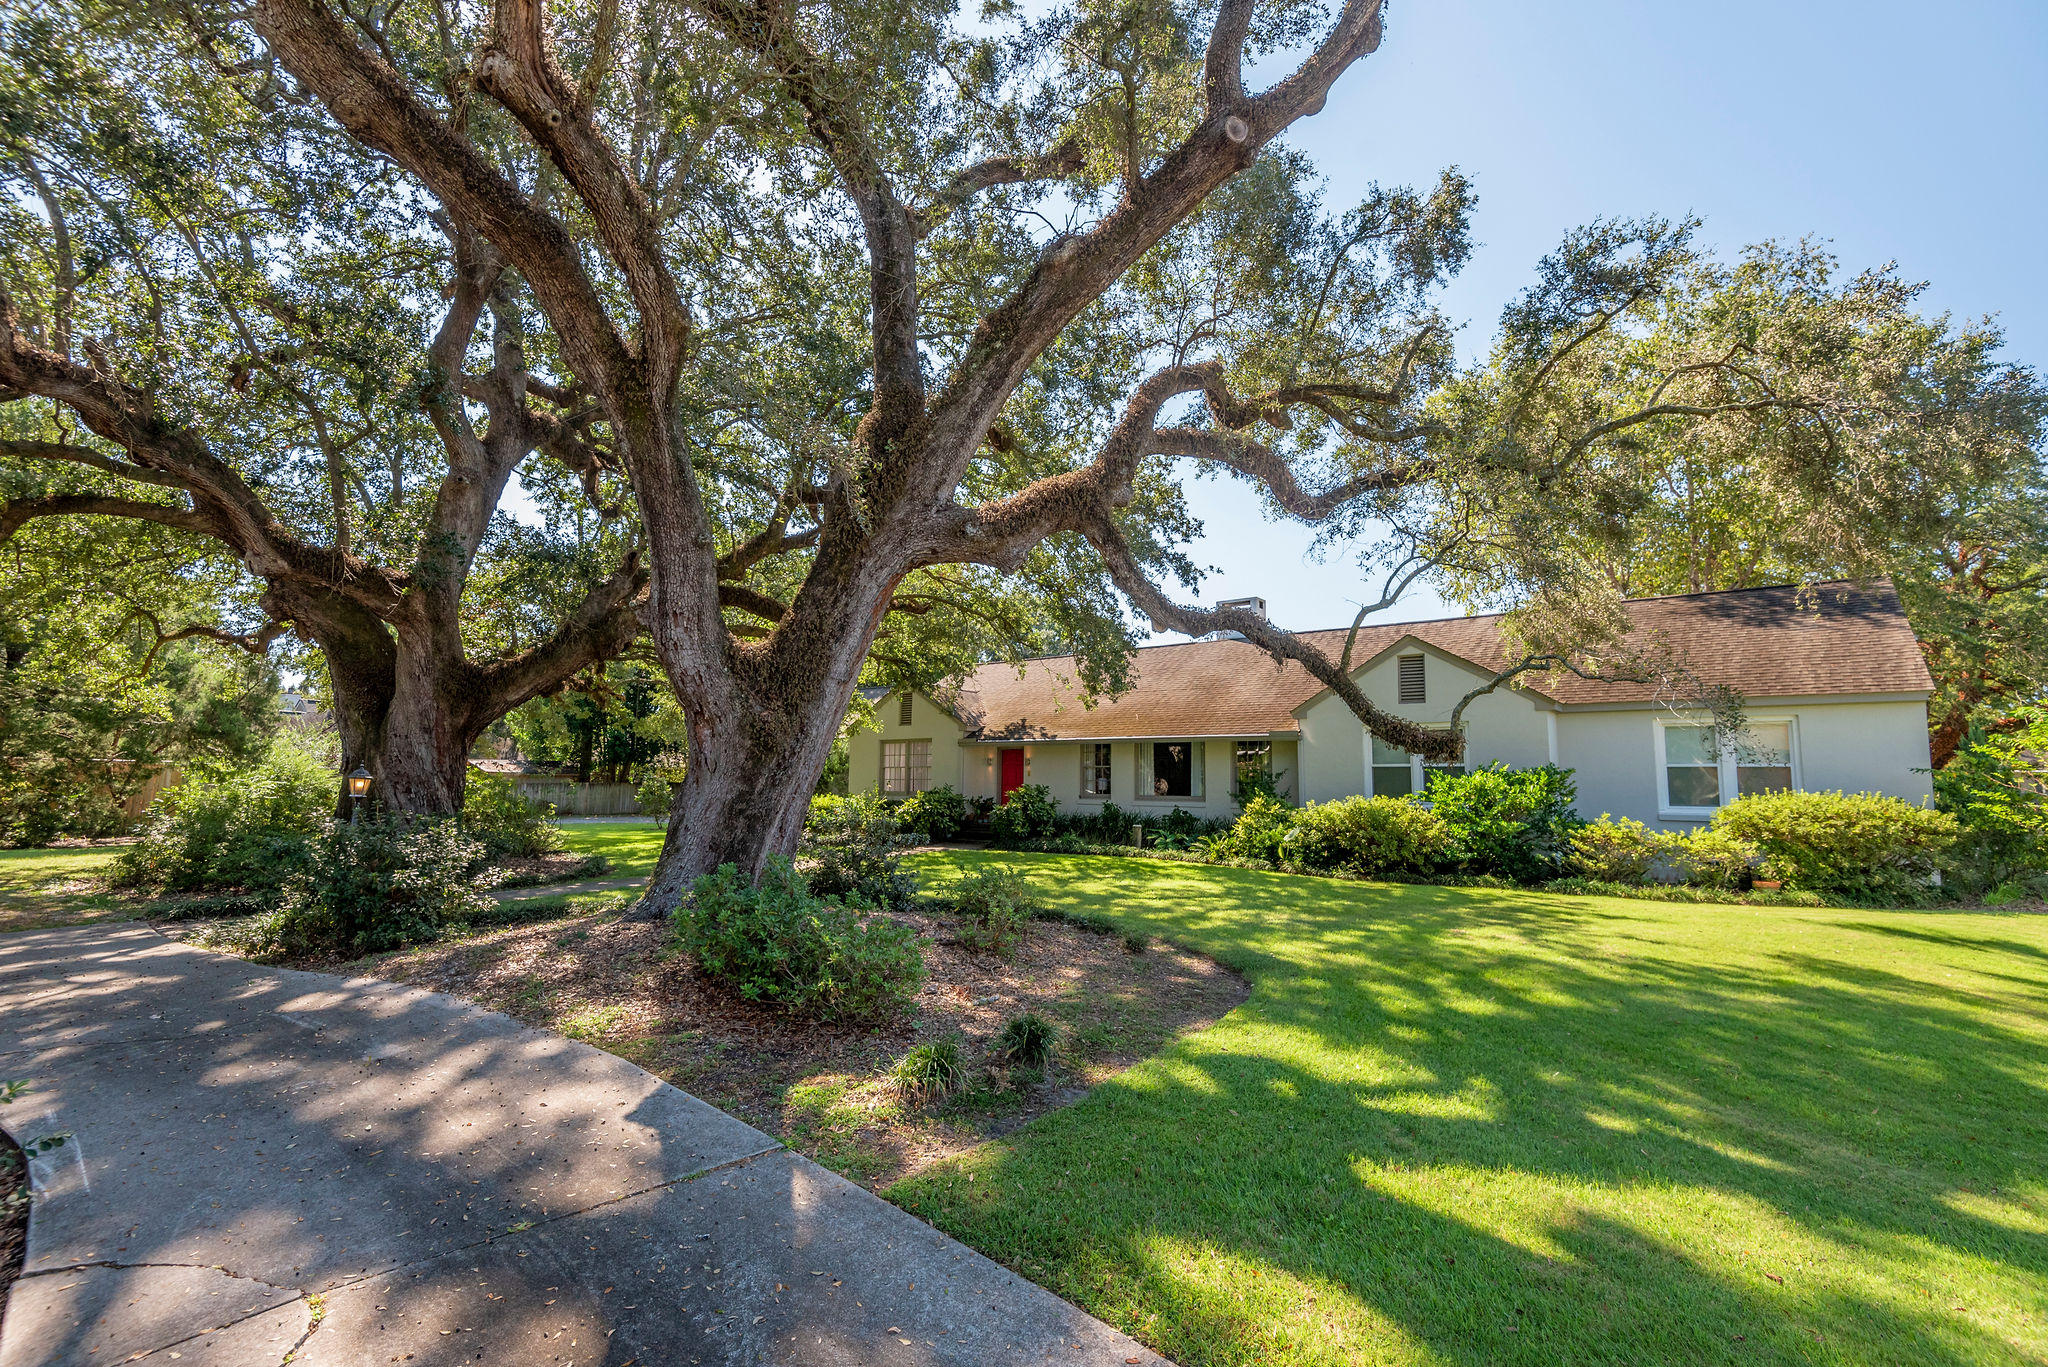 Sylvan Shores Homes For Sale - 450 Polony, Charleston, SC - 1